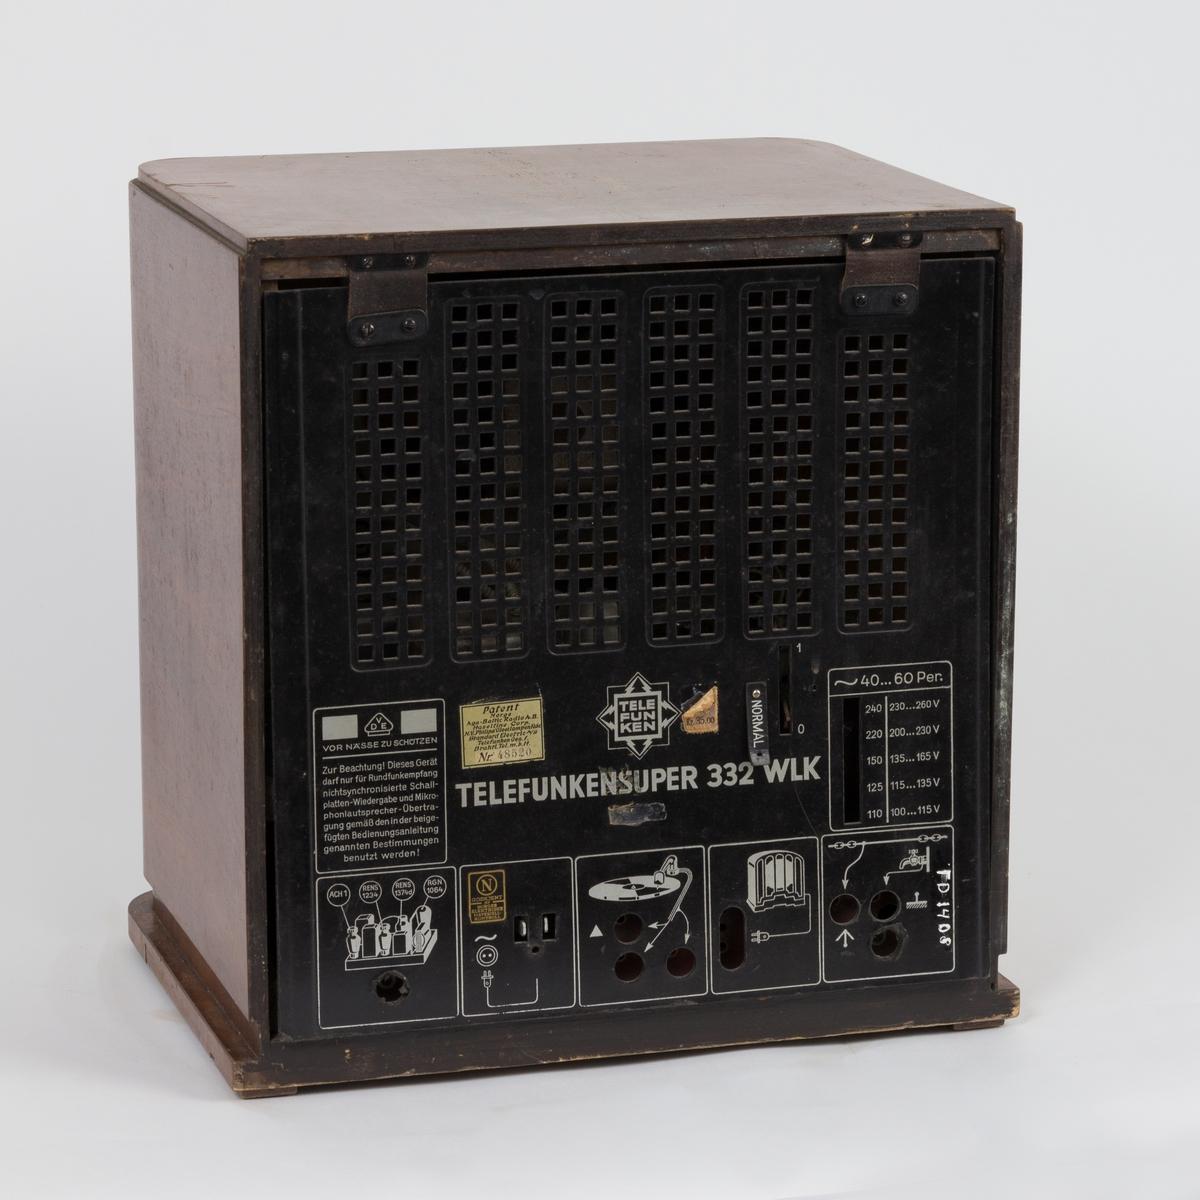 Telefunken super 332 WLK radio